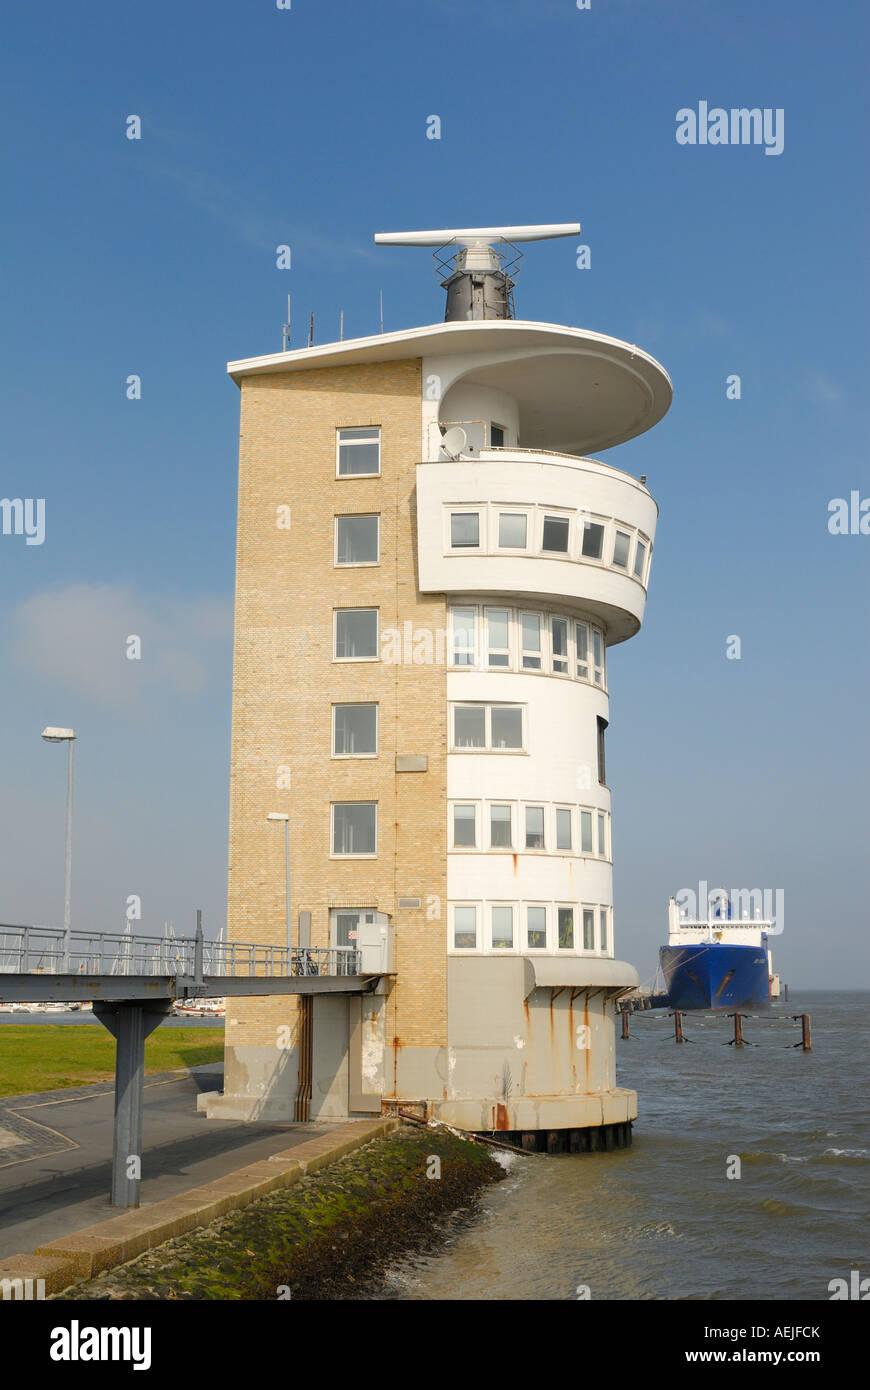 Cuxhaven - average command - Lower Saxony, Germany, Europe. - Stock Image